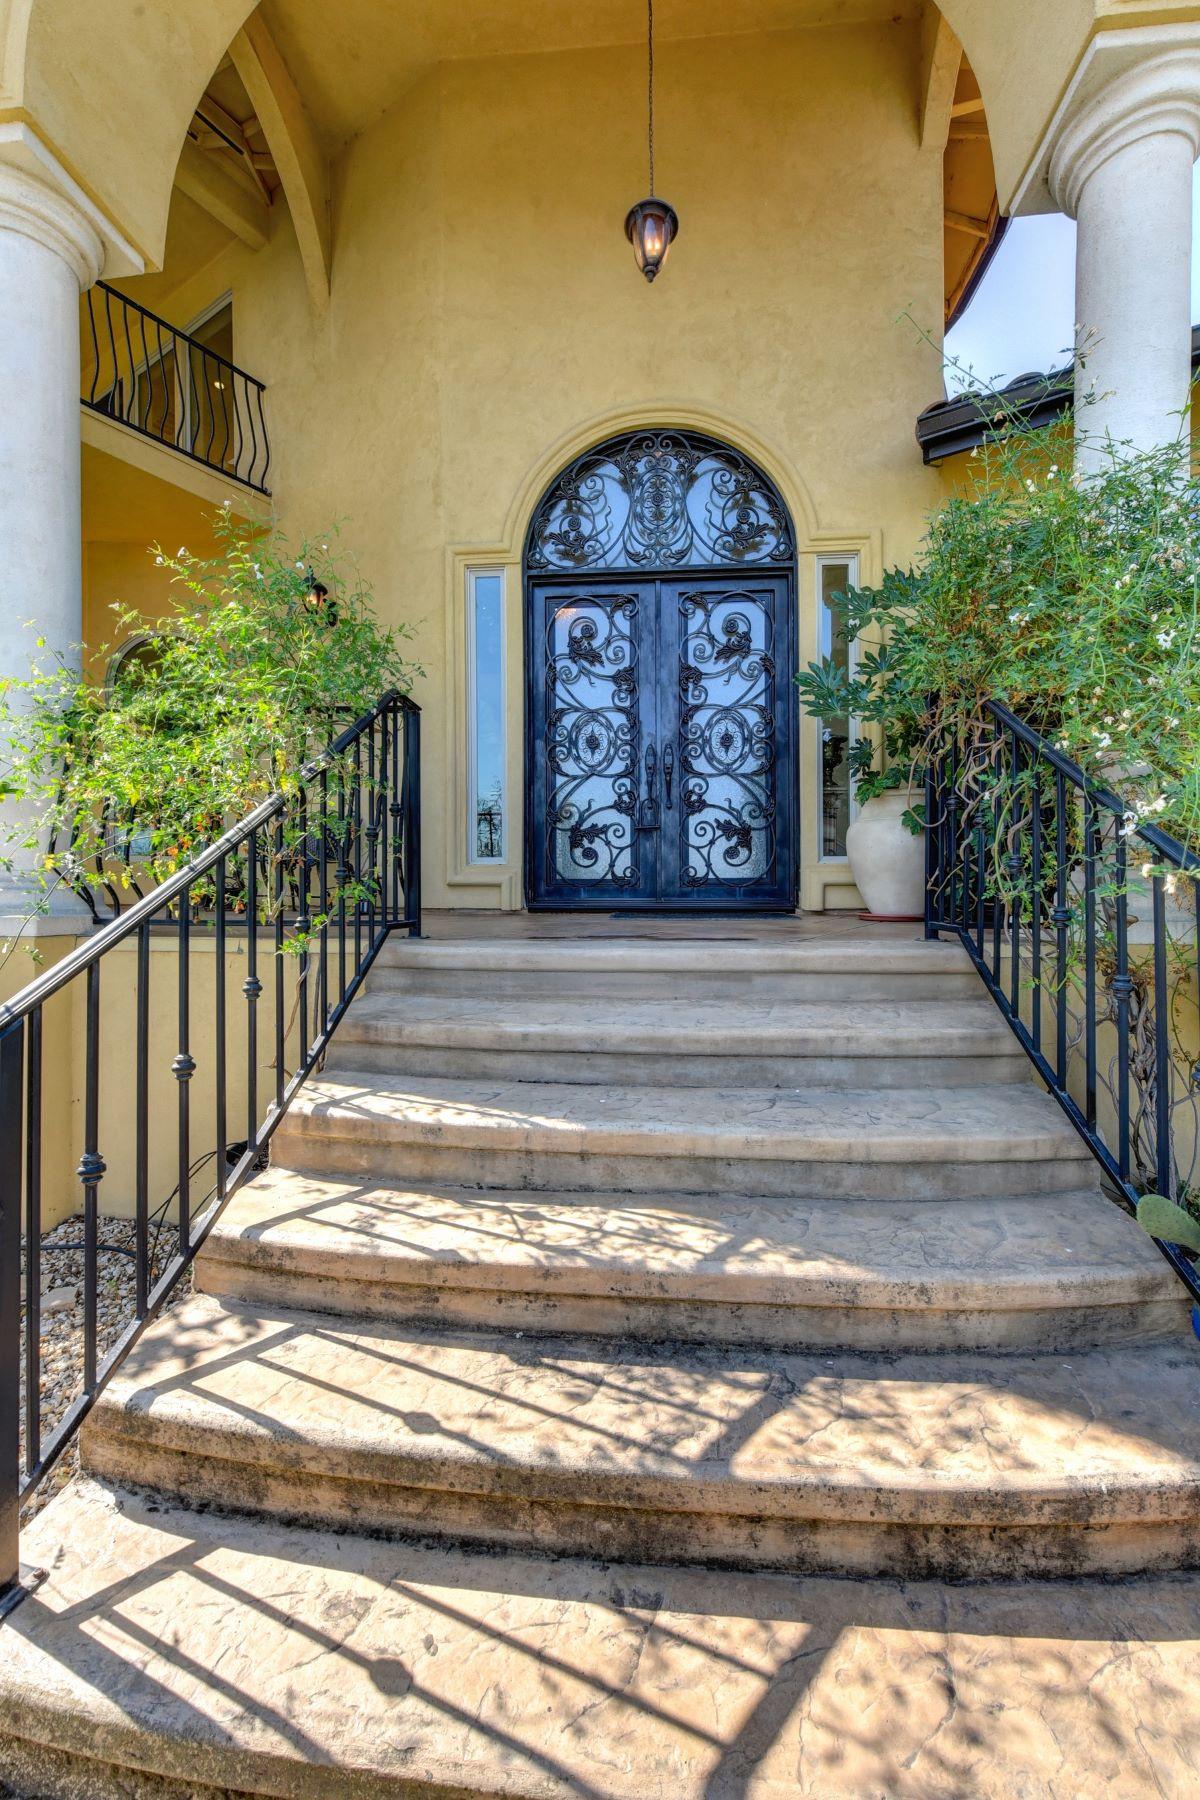 Single Family Home for Sale at 1610 Zapata Drive, El Dorado Hills, CA 95762 El Dorado Hills, California 95762 United States